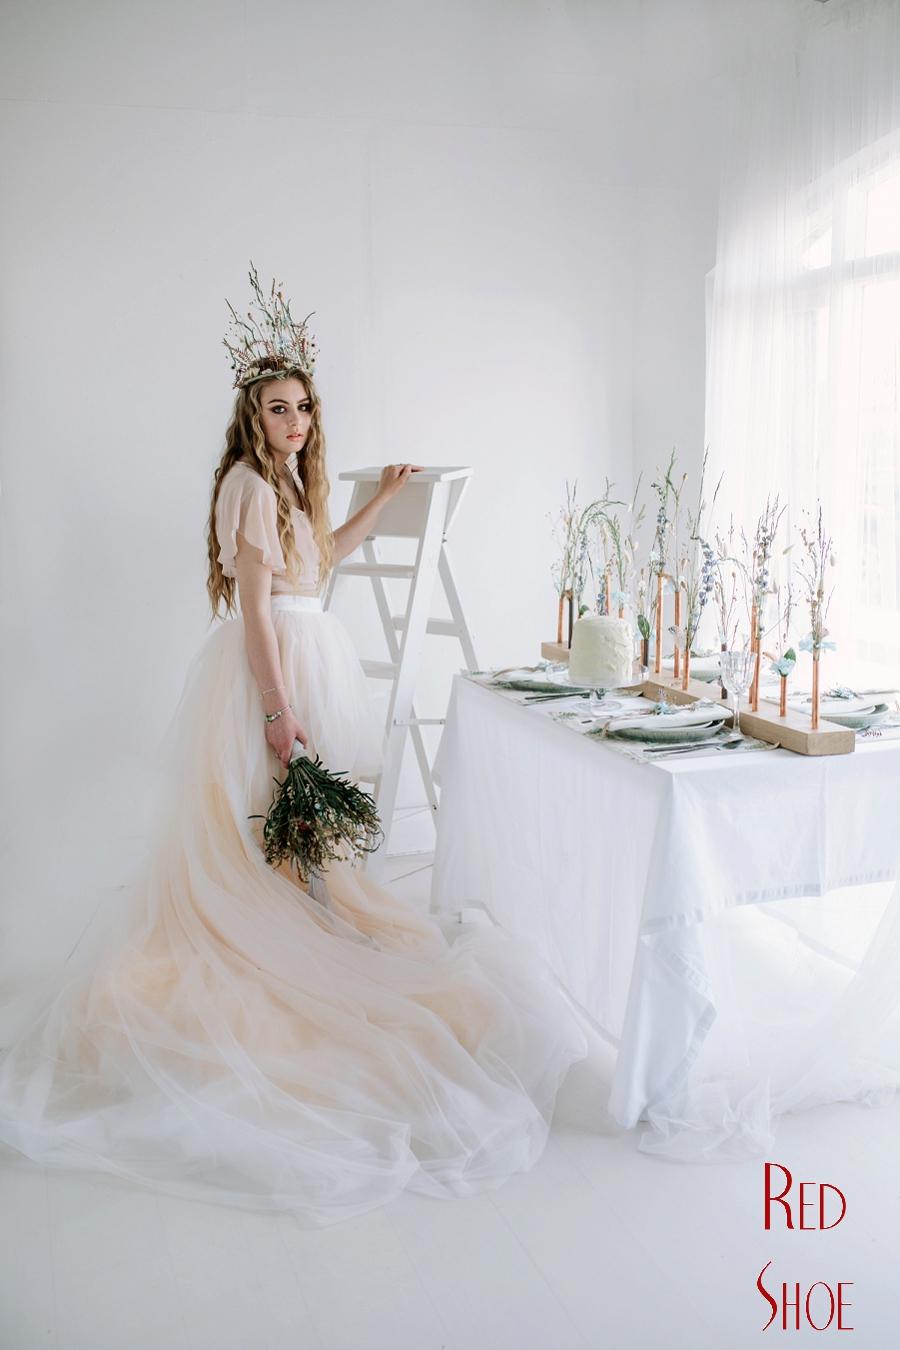 Boho bride, Glam Boho bride, Wedding inspiration, Styled wedding photo shoot, wedding ideas, wedding flower ideas, wedding photography, dried wedding flowers, boho bride makeup ideas_0049.jpg